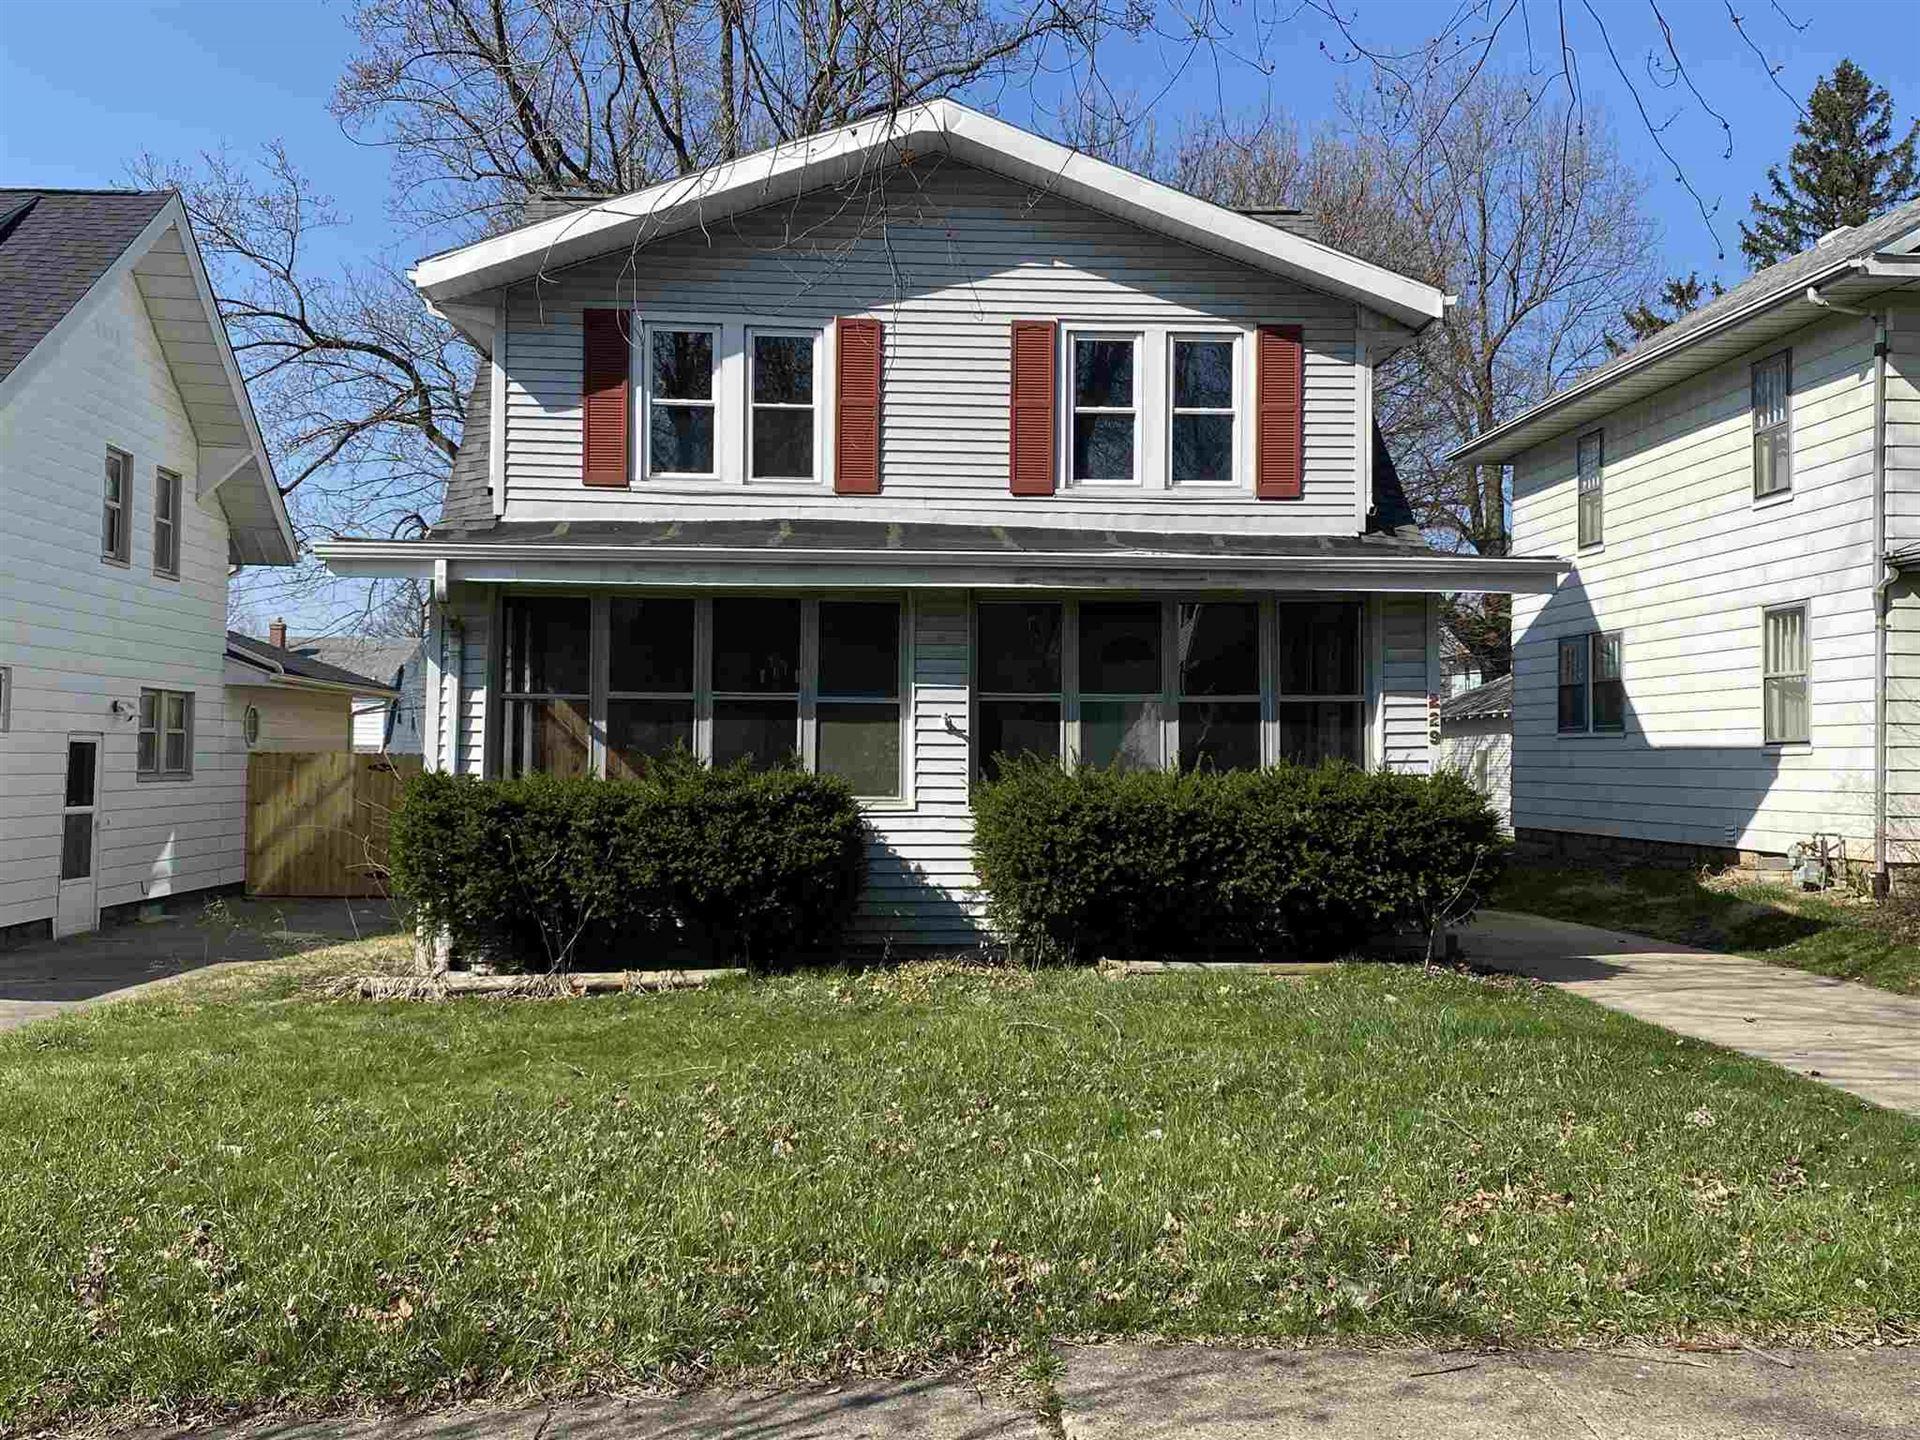 229 E Eckman Street, South Bend, IN 46614 - #: 202014416